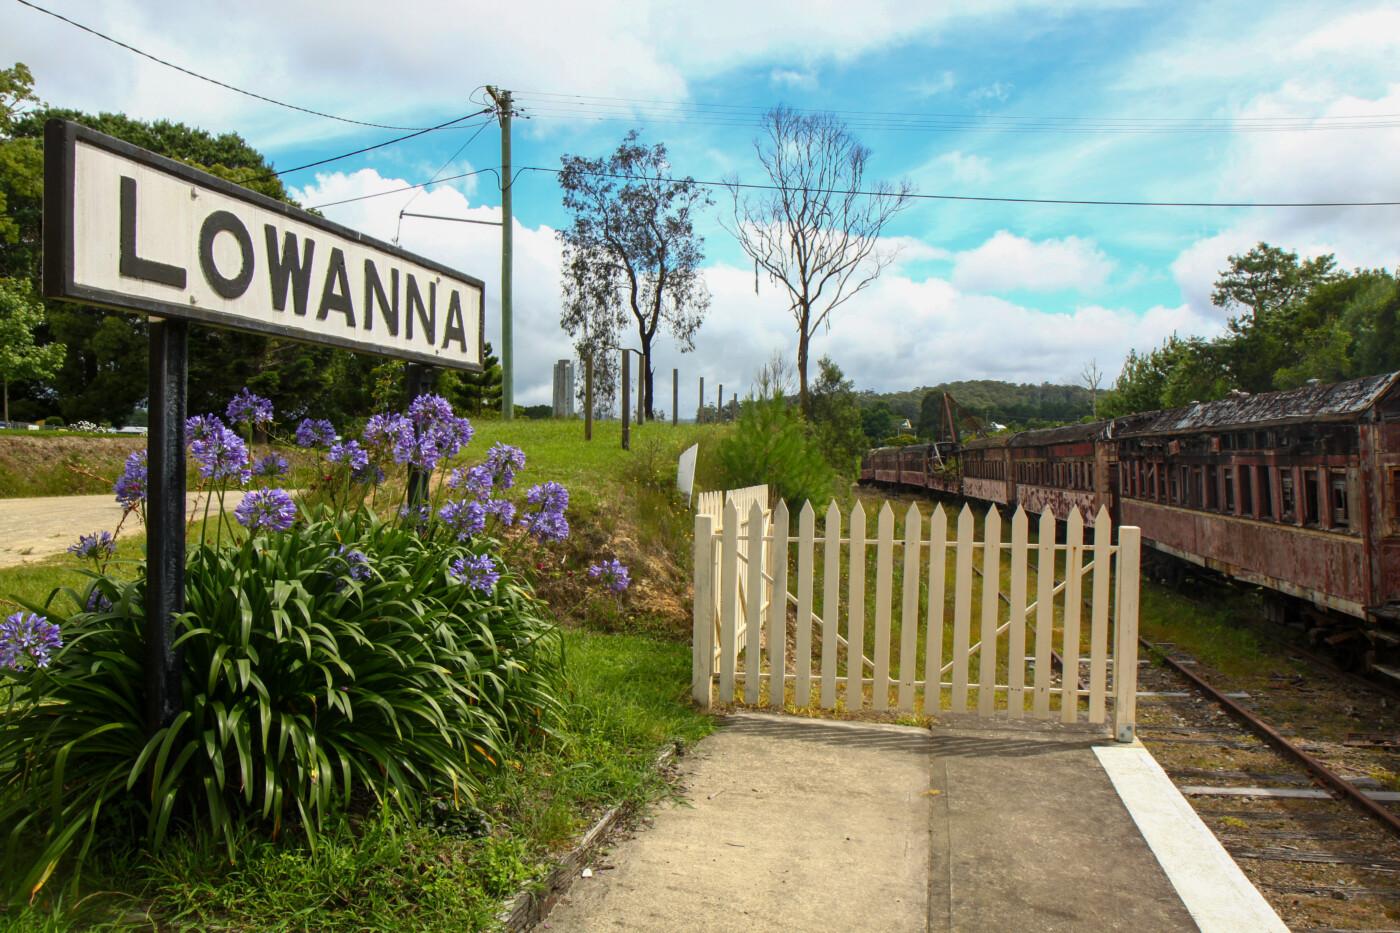 Lowanna Station